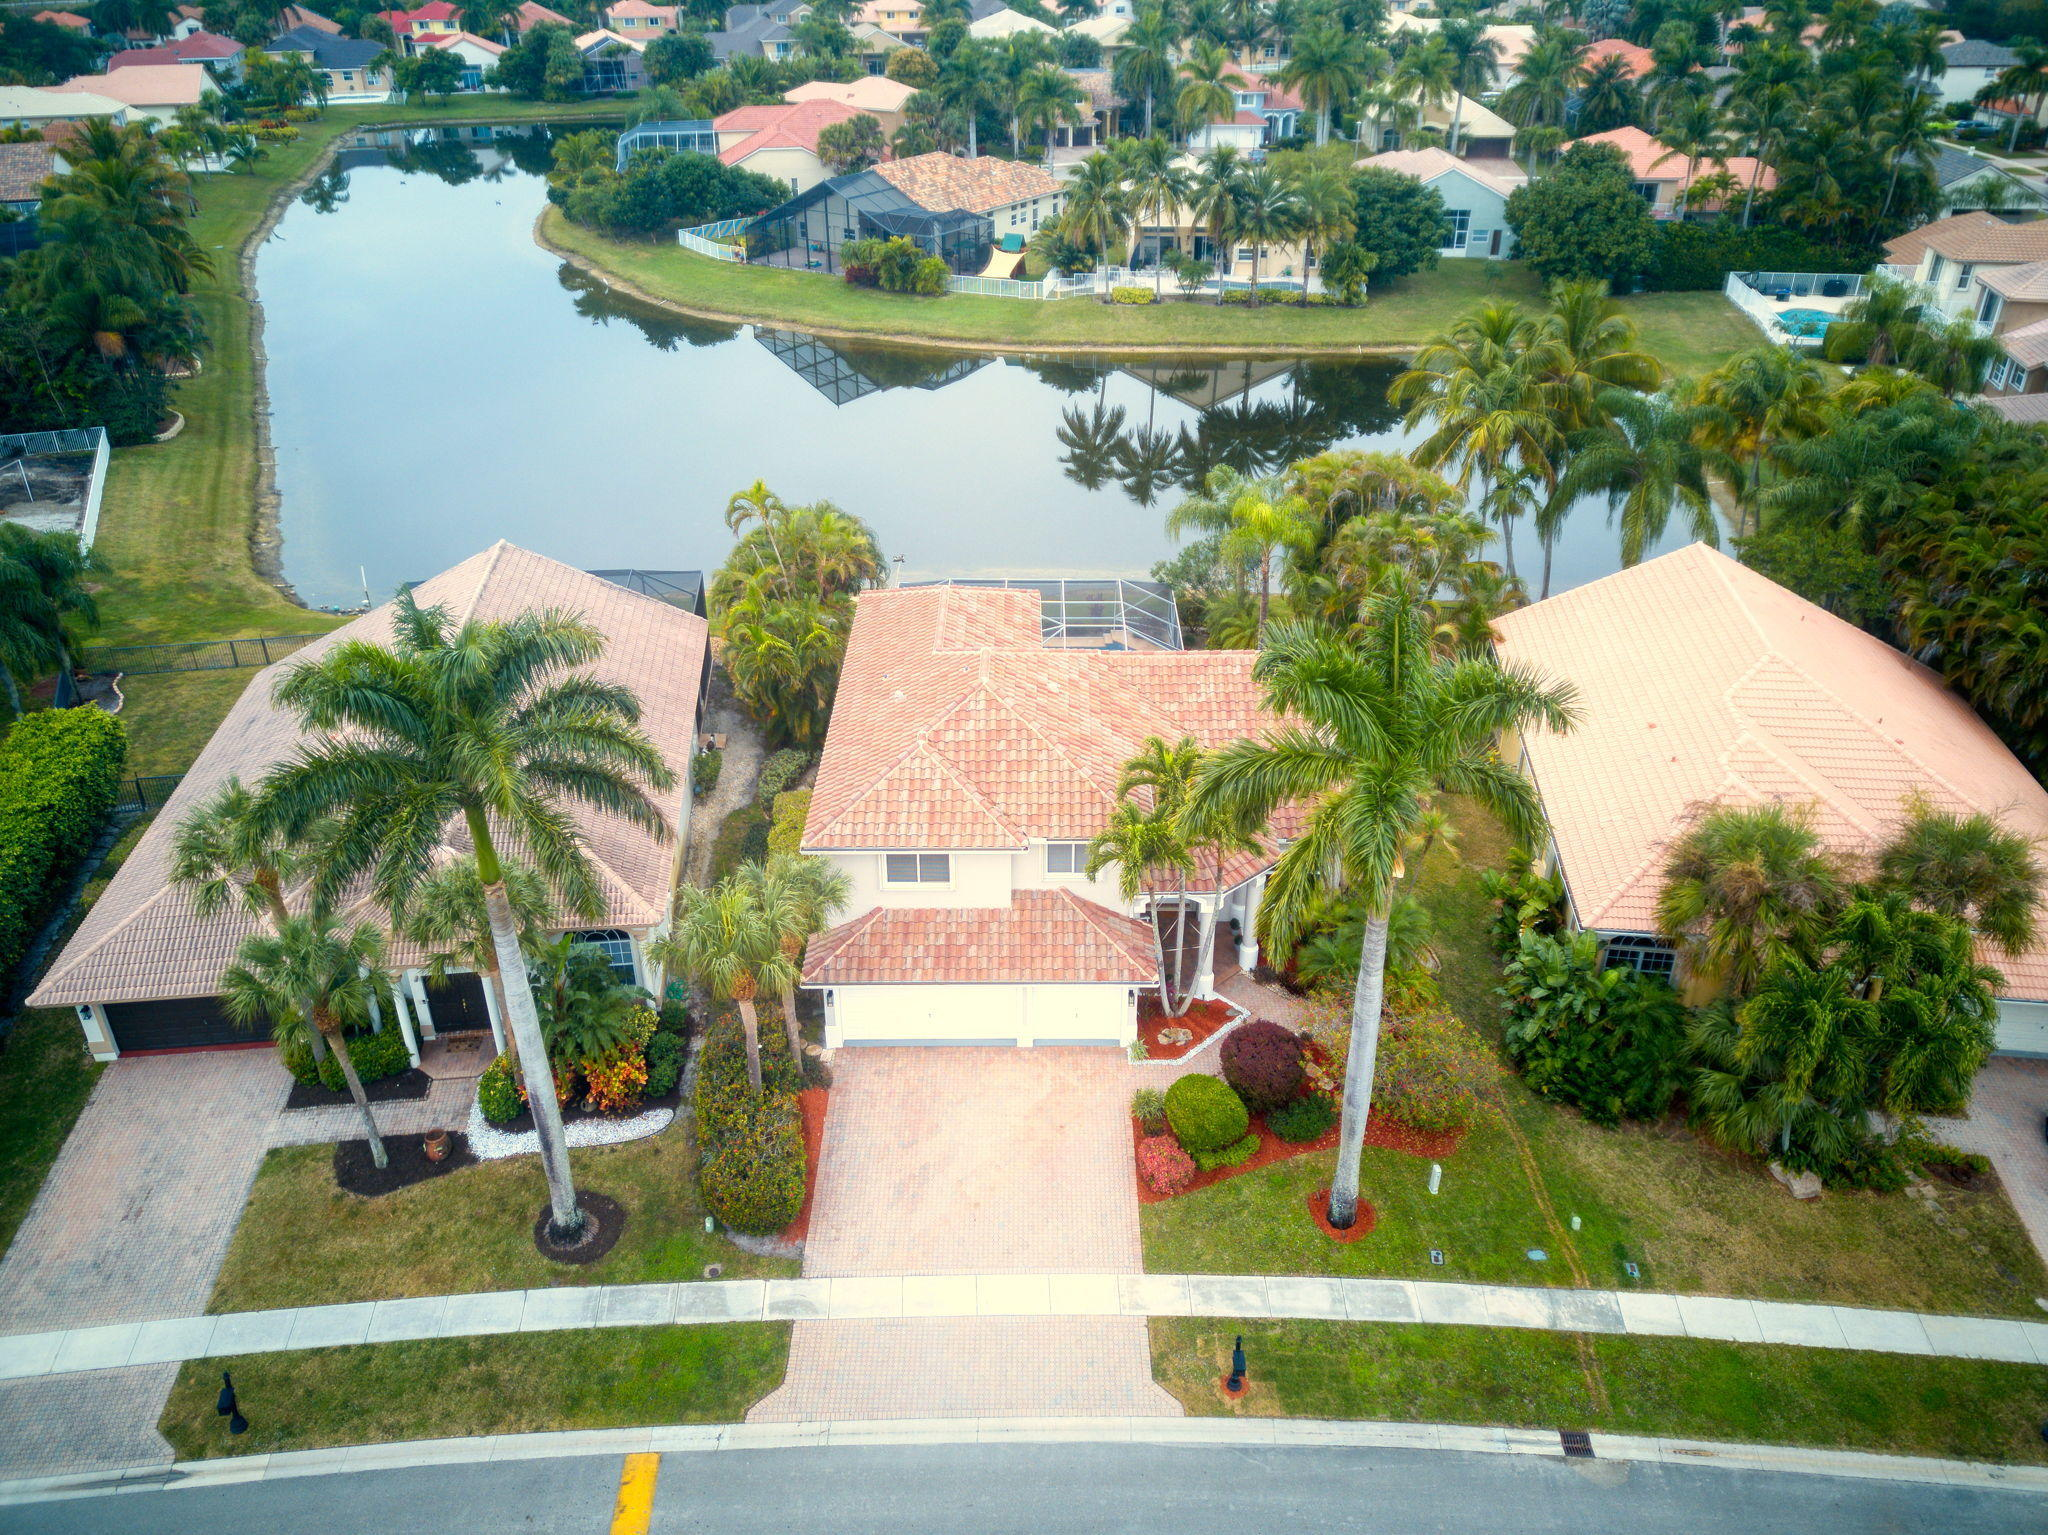 Photo of 10672 St Thomas Drive, Boca Raton, FL 33498